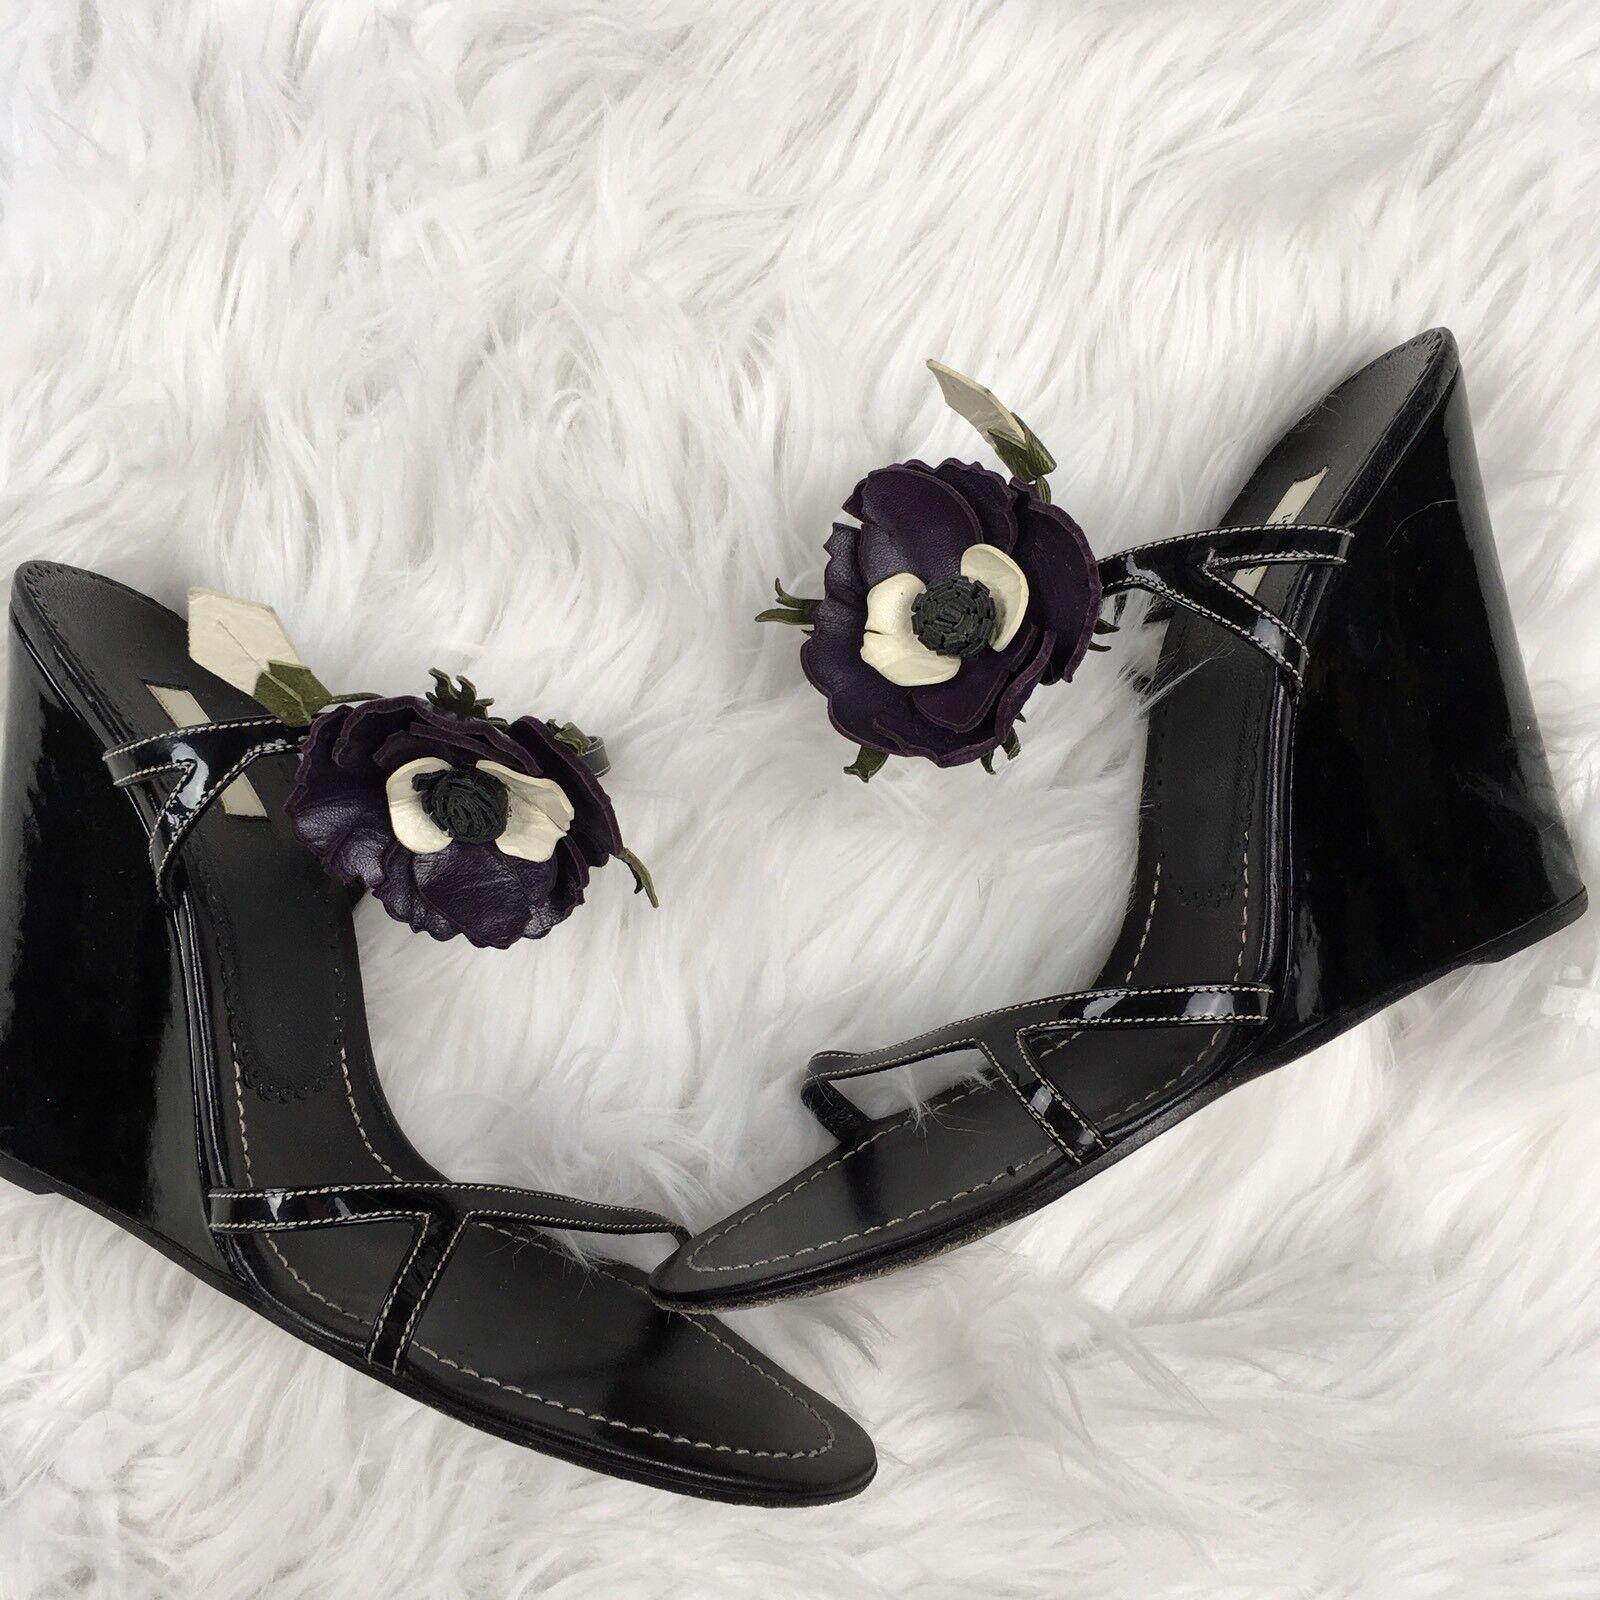 Prada Sandalias de cuña para para para mujer Talla 41 Charol Negro Flor Flor Con Tiras  ventas directas de fábrica